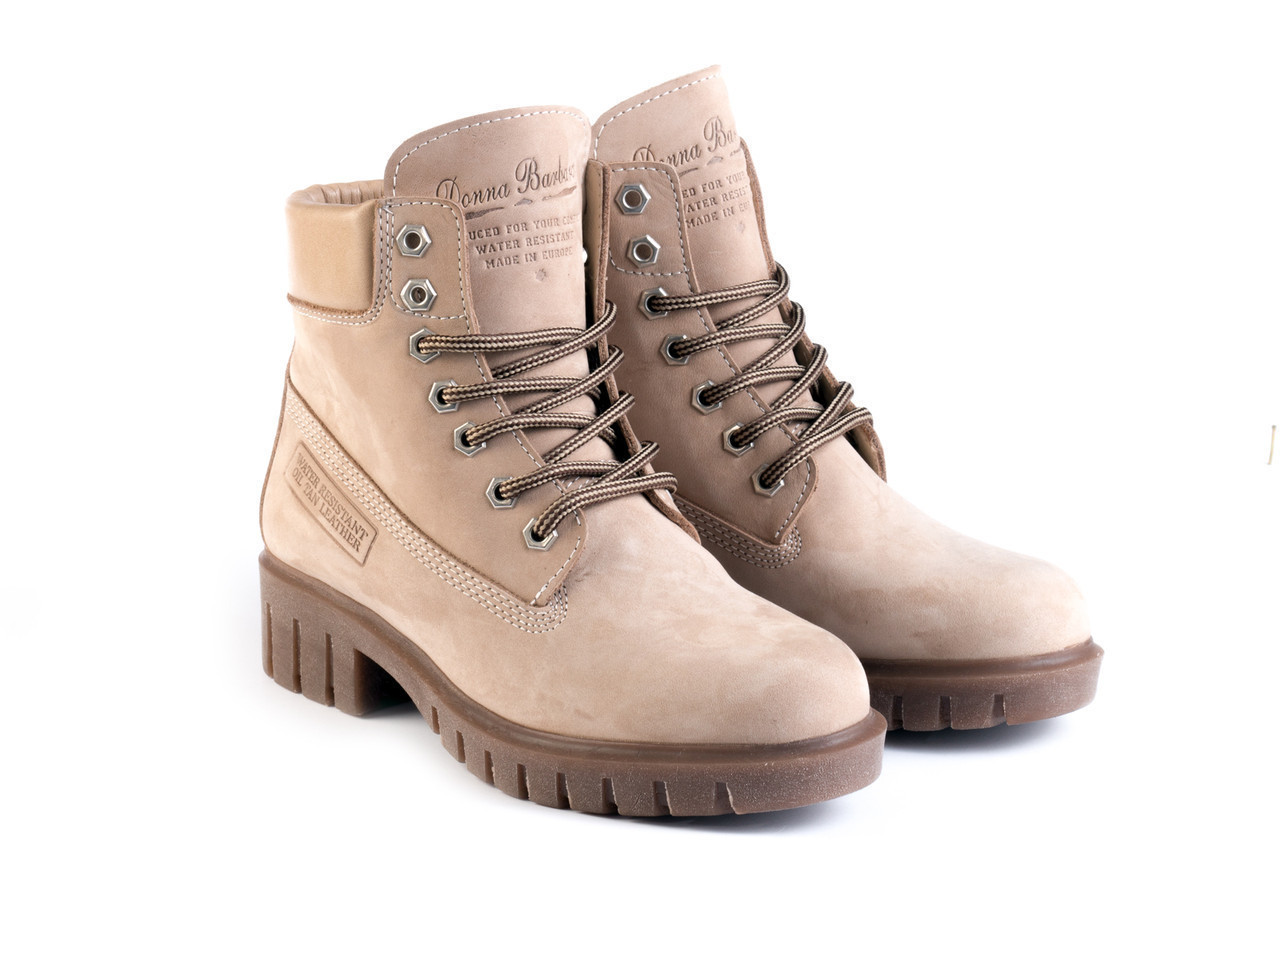 Ботинки Etor 5169-021554-832 40 бежевые